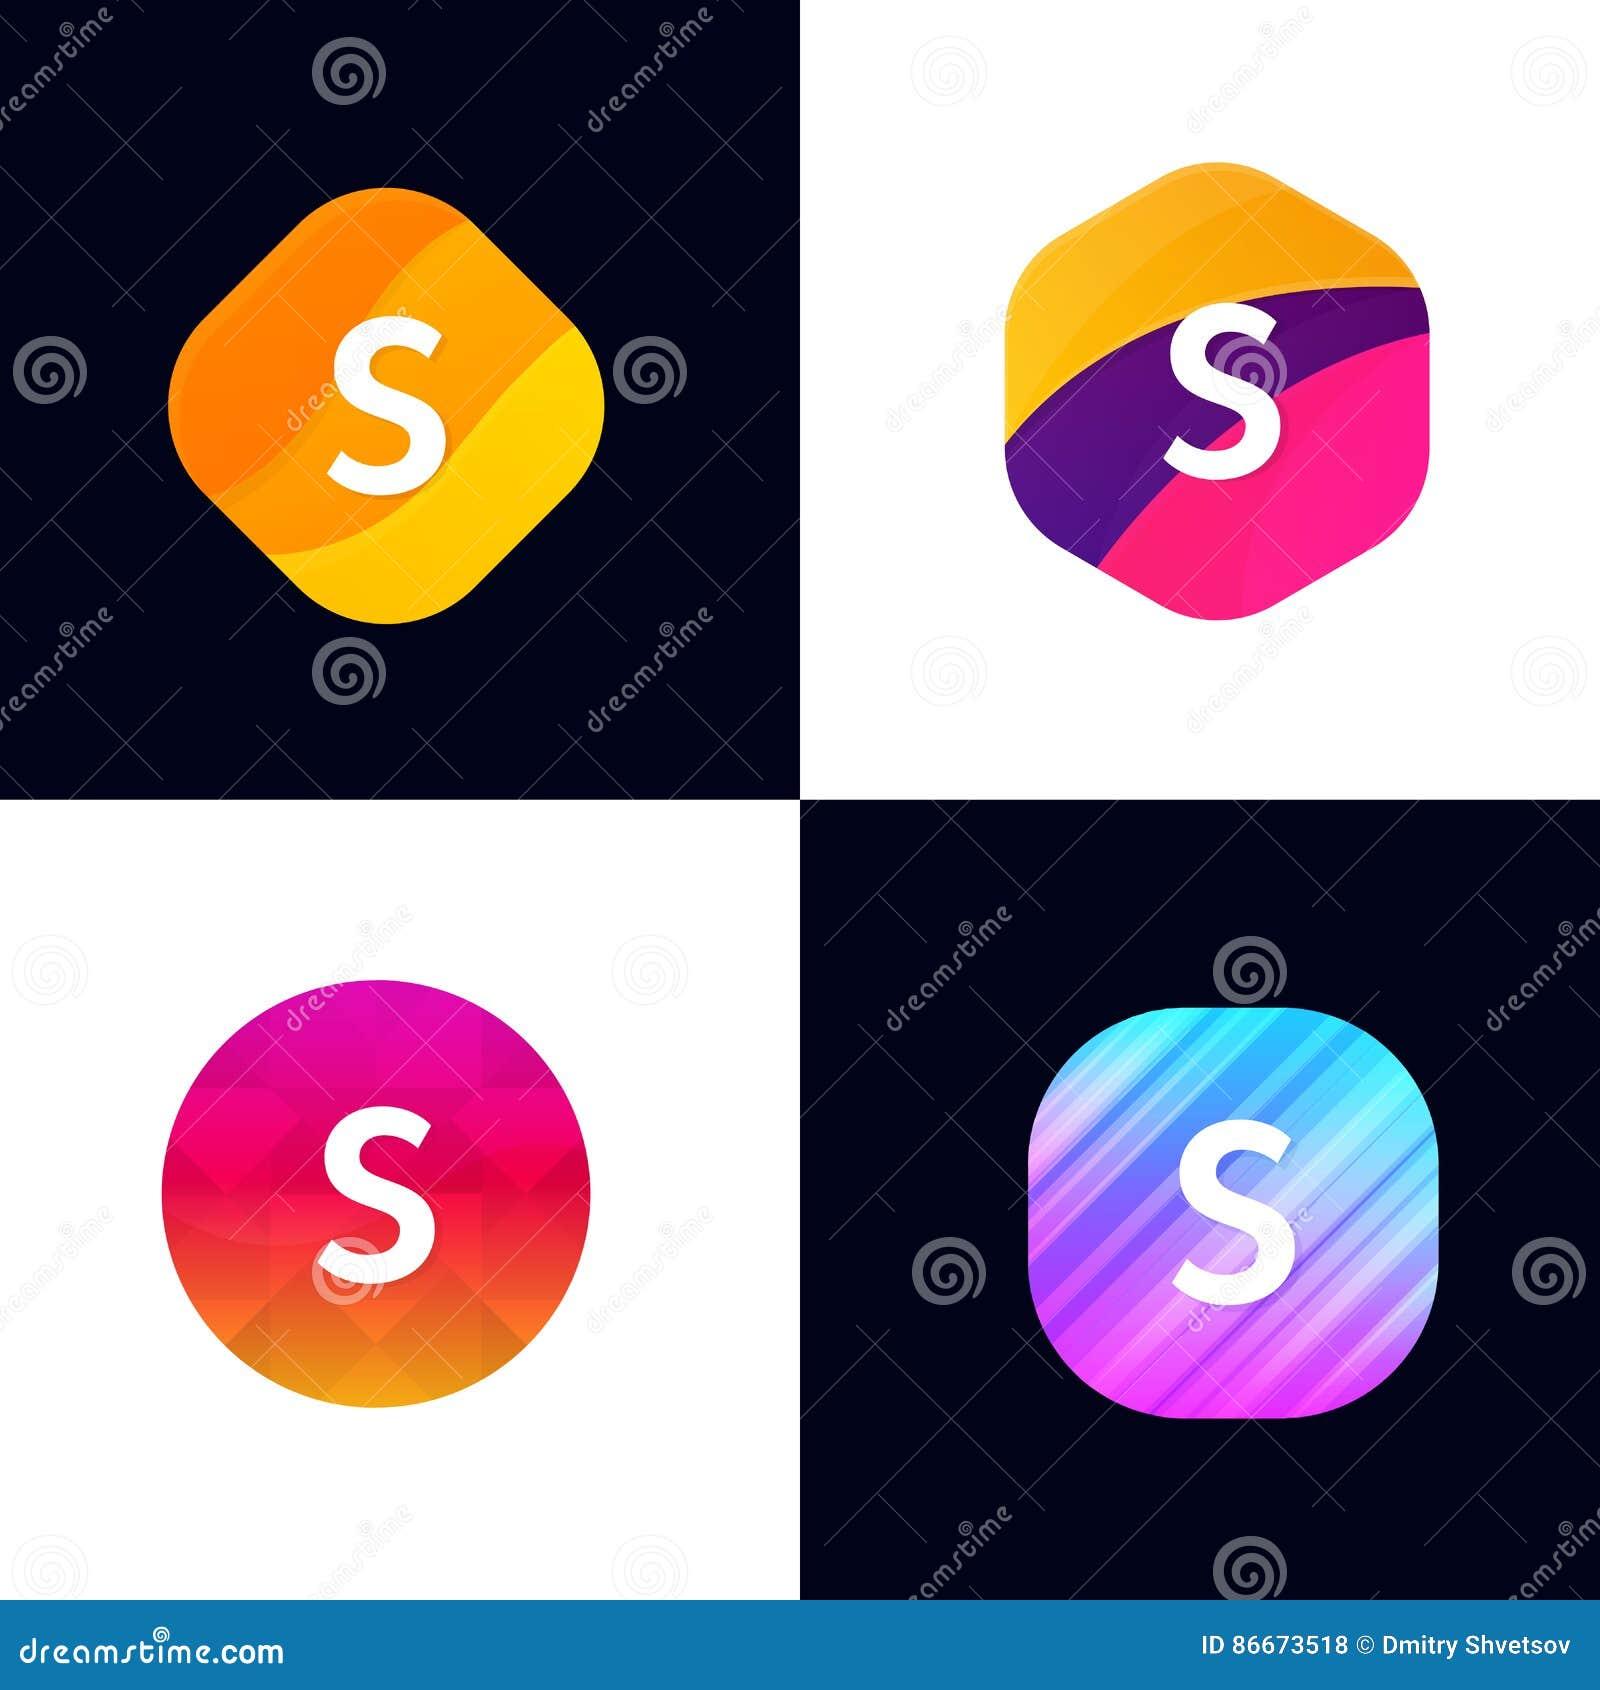 S Letter Vector Company Icon Signs Flat Symbols Logo Set Stock